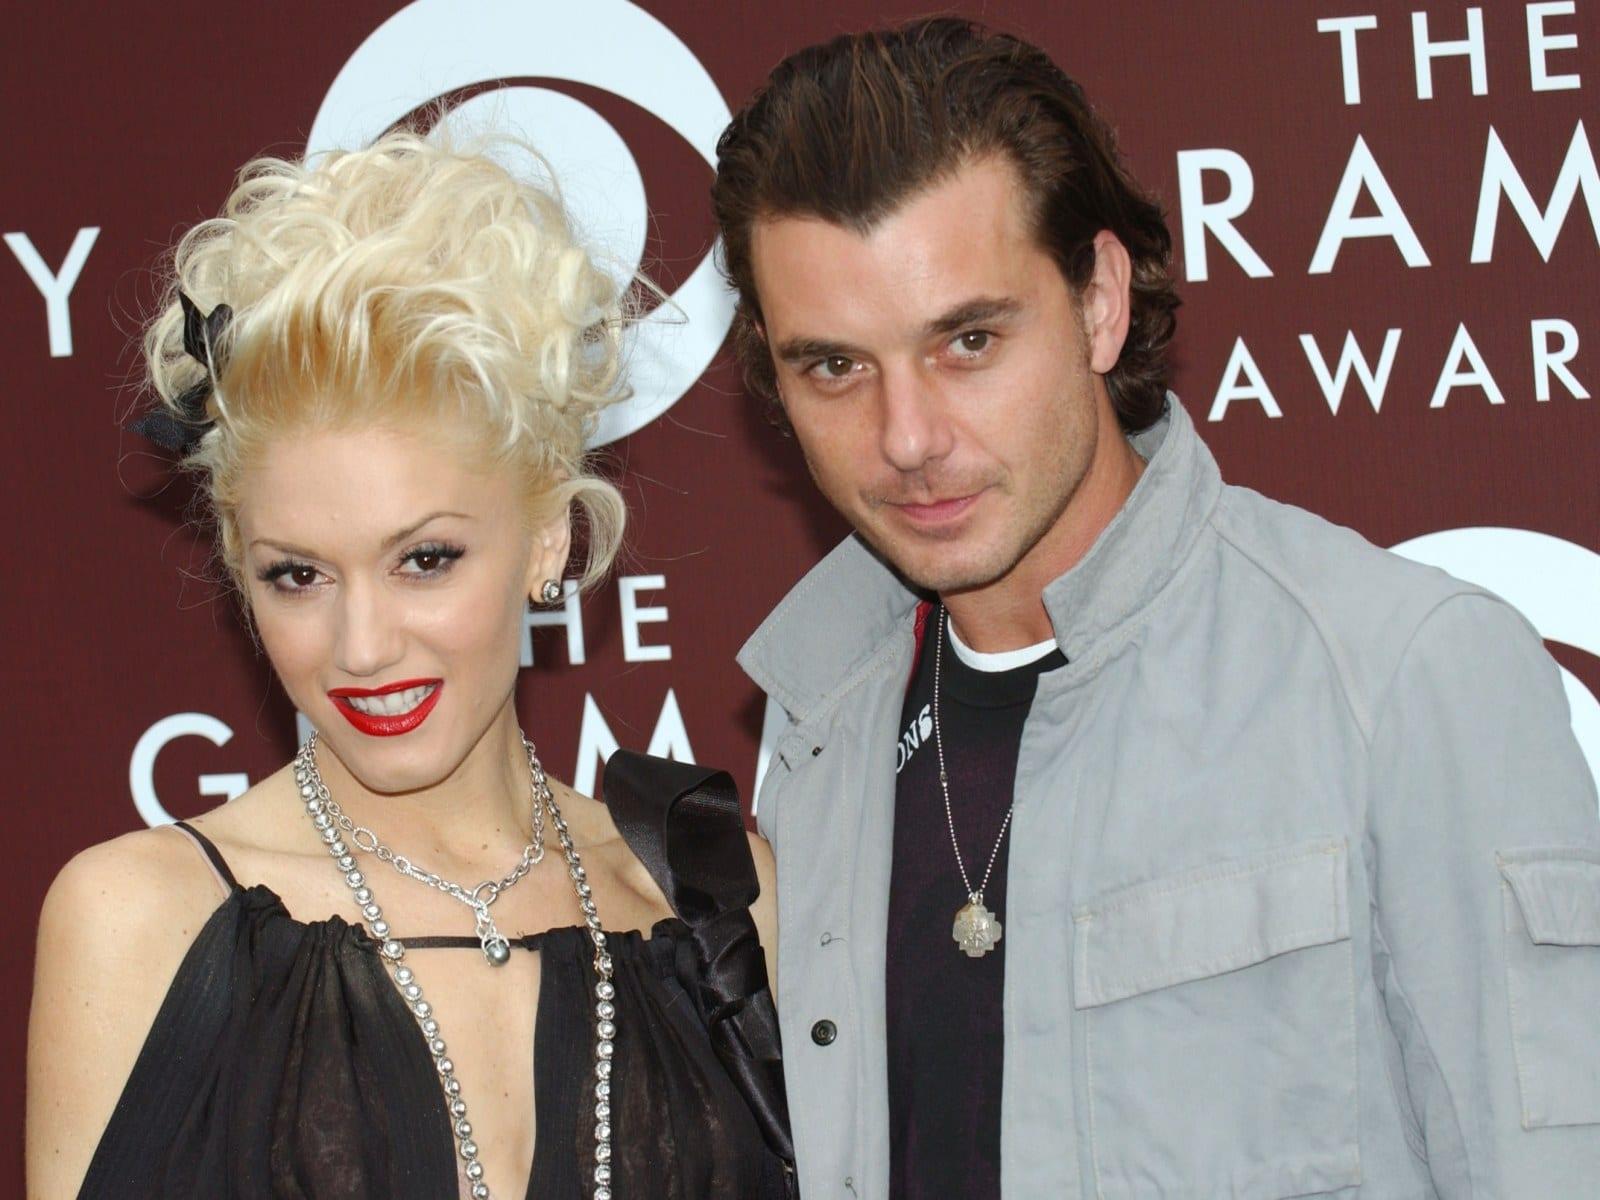 Why Did Gwen And Gavin Break Up